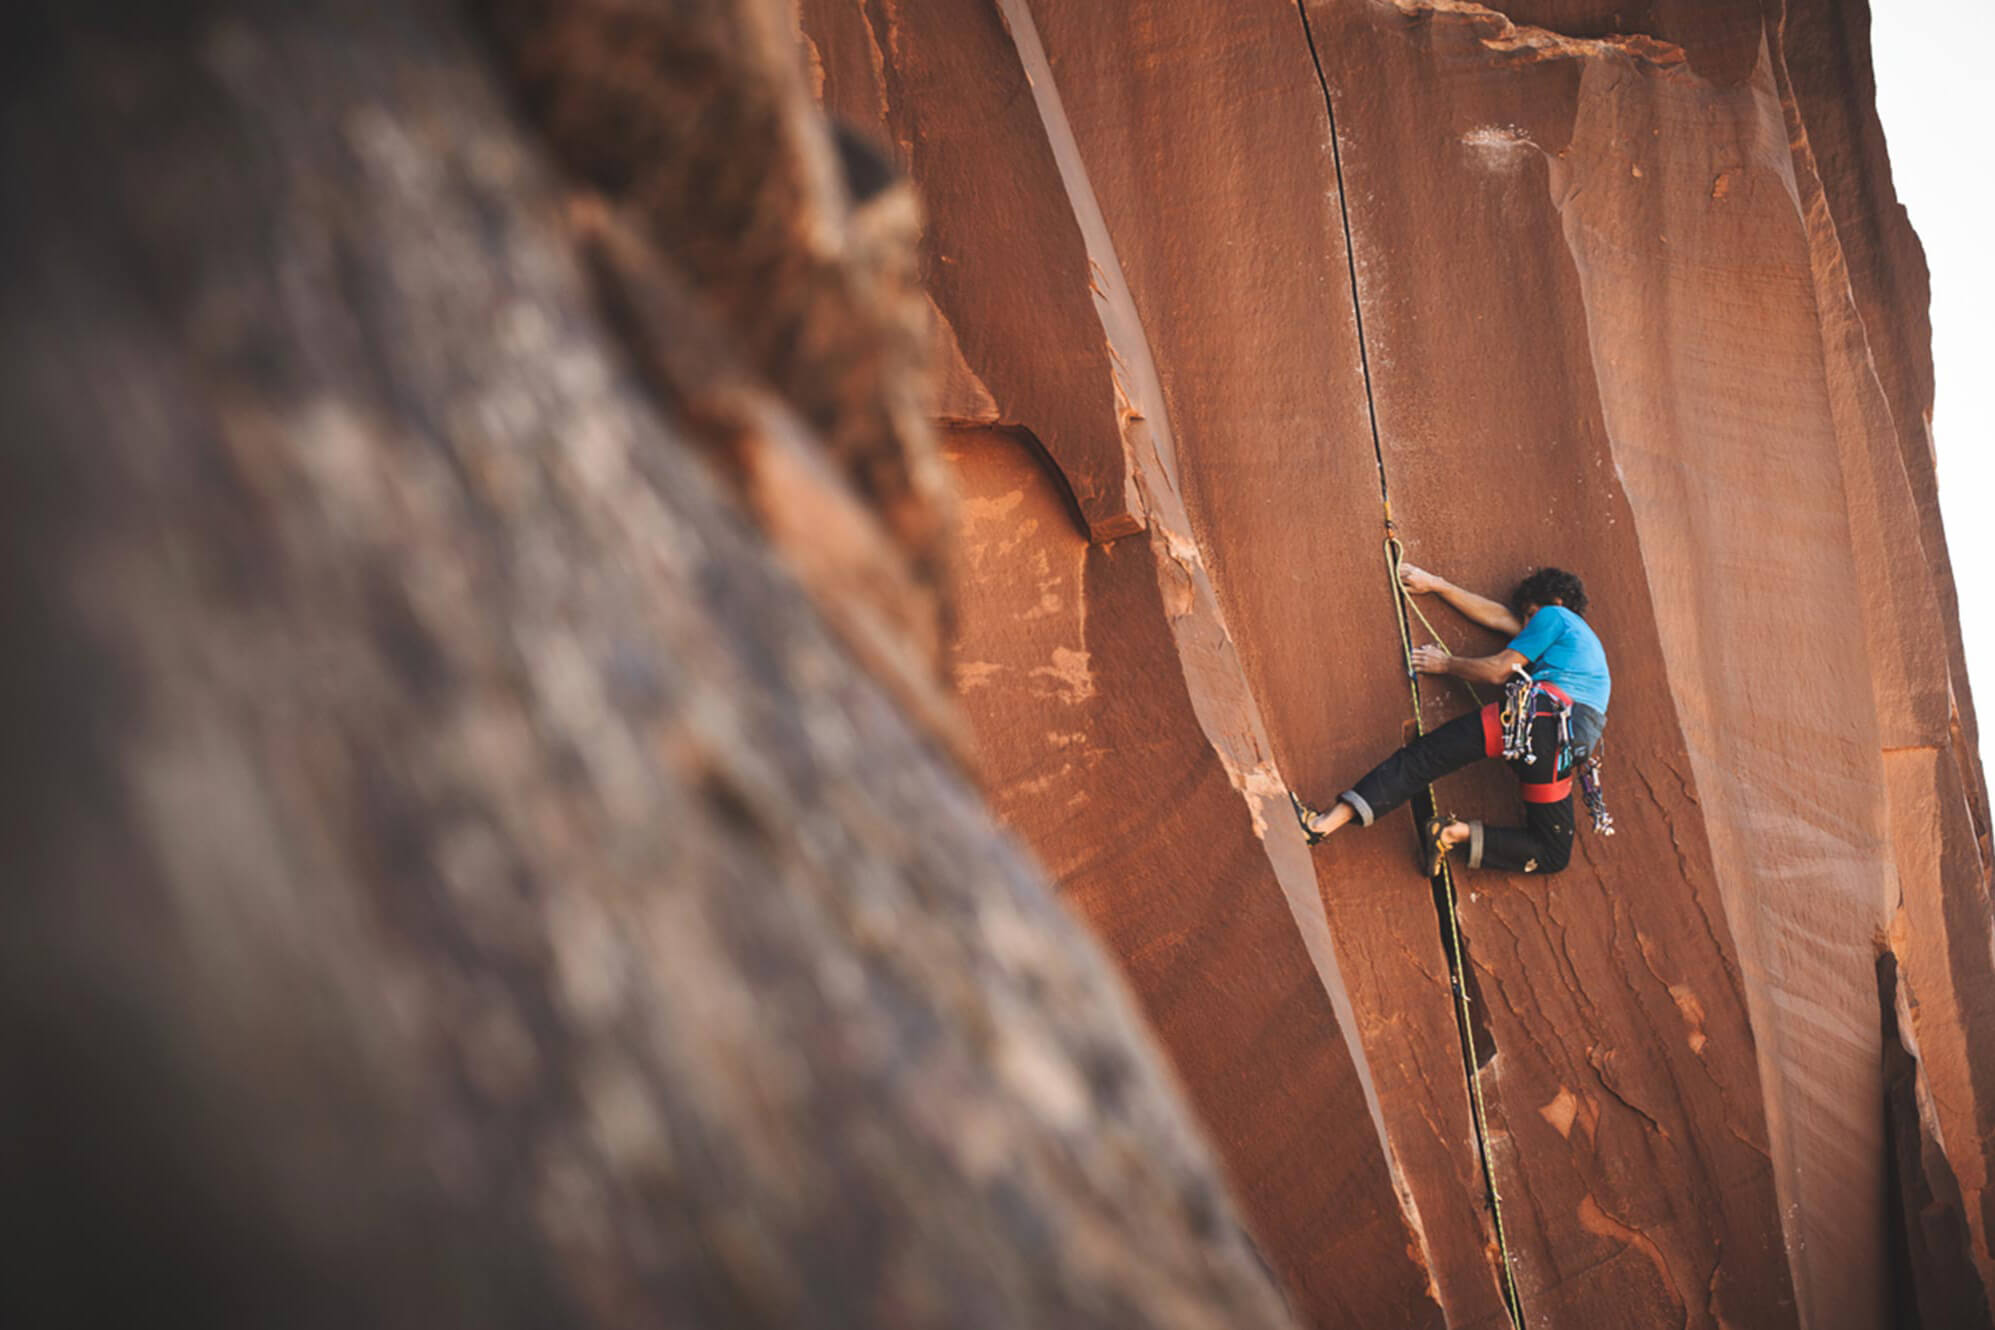 Jacopo-Larcher-climb-04